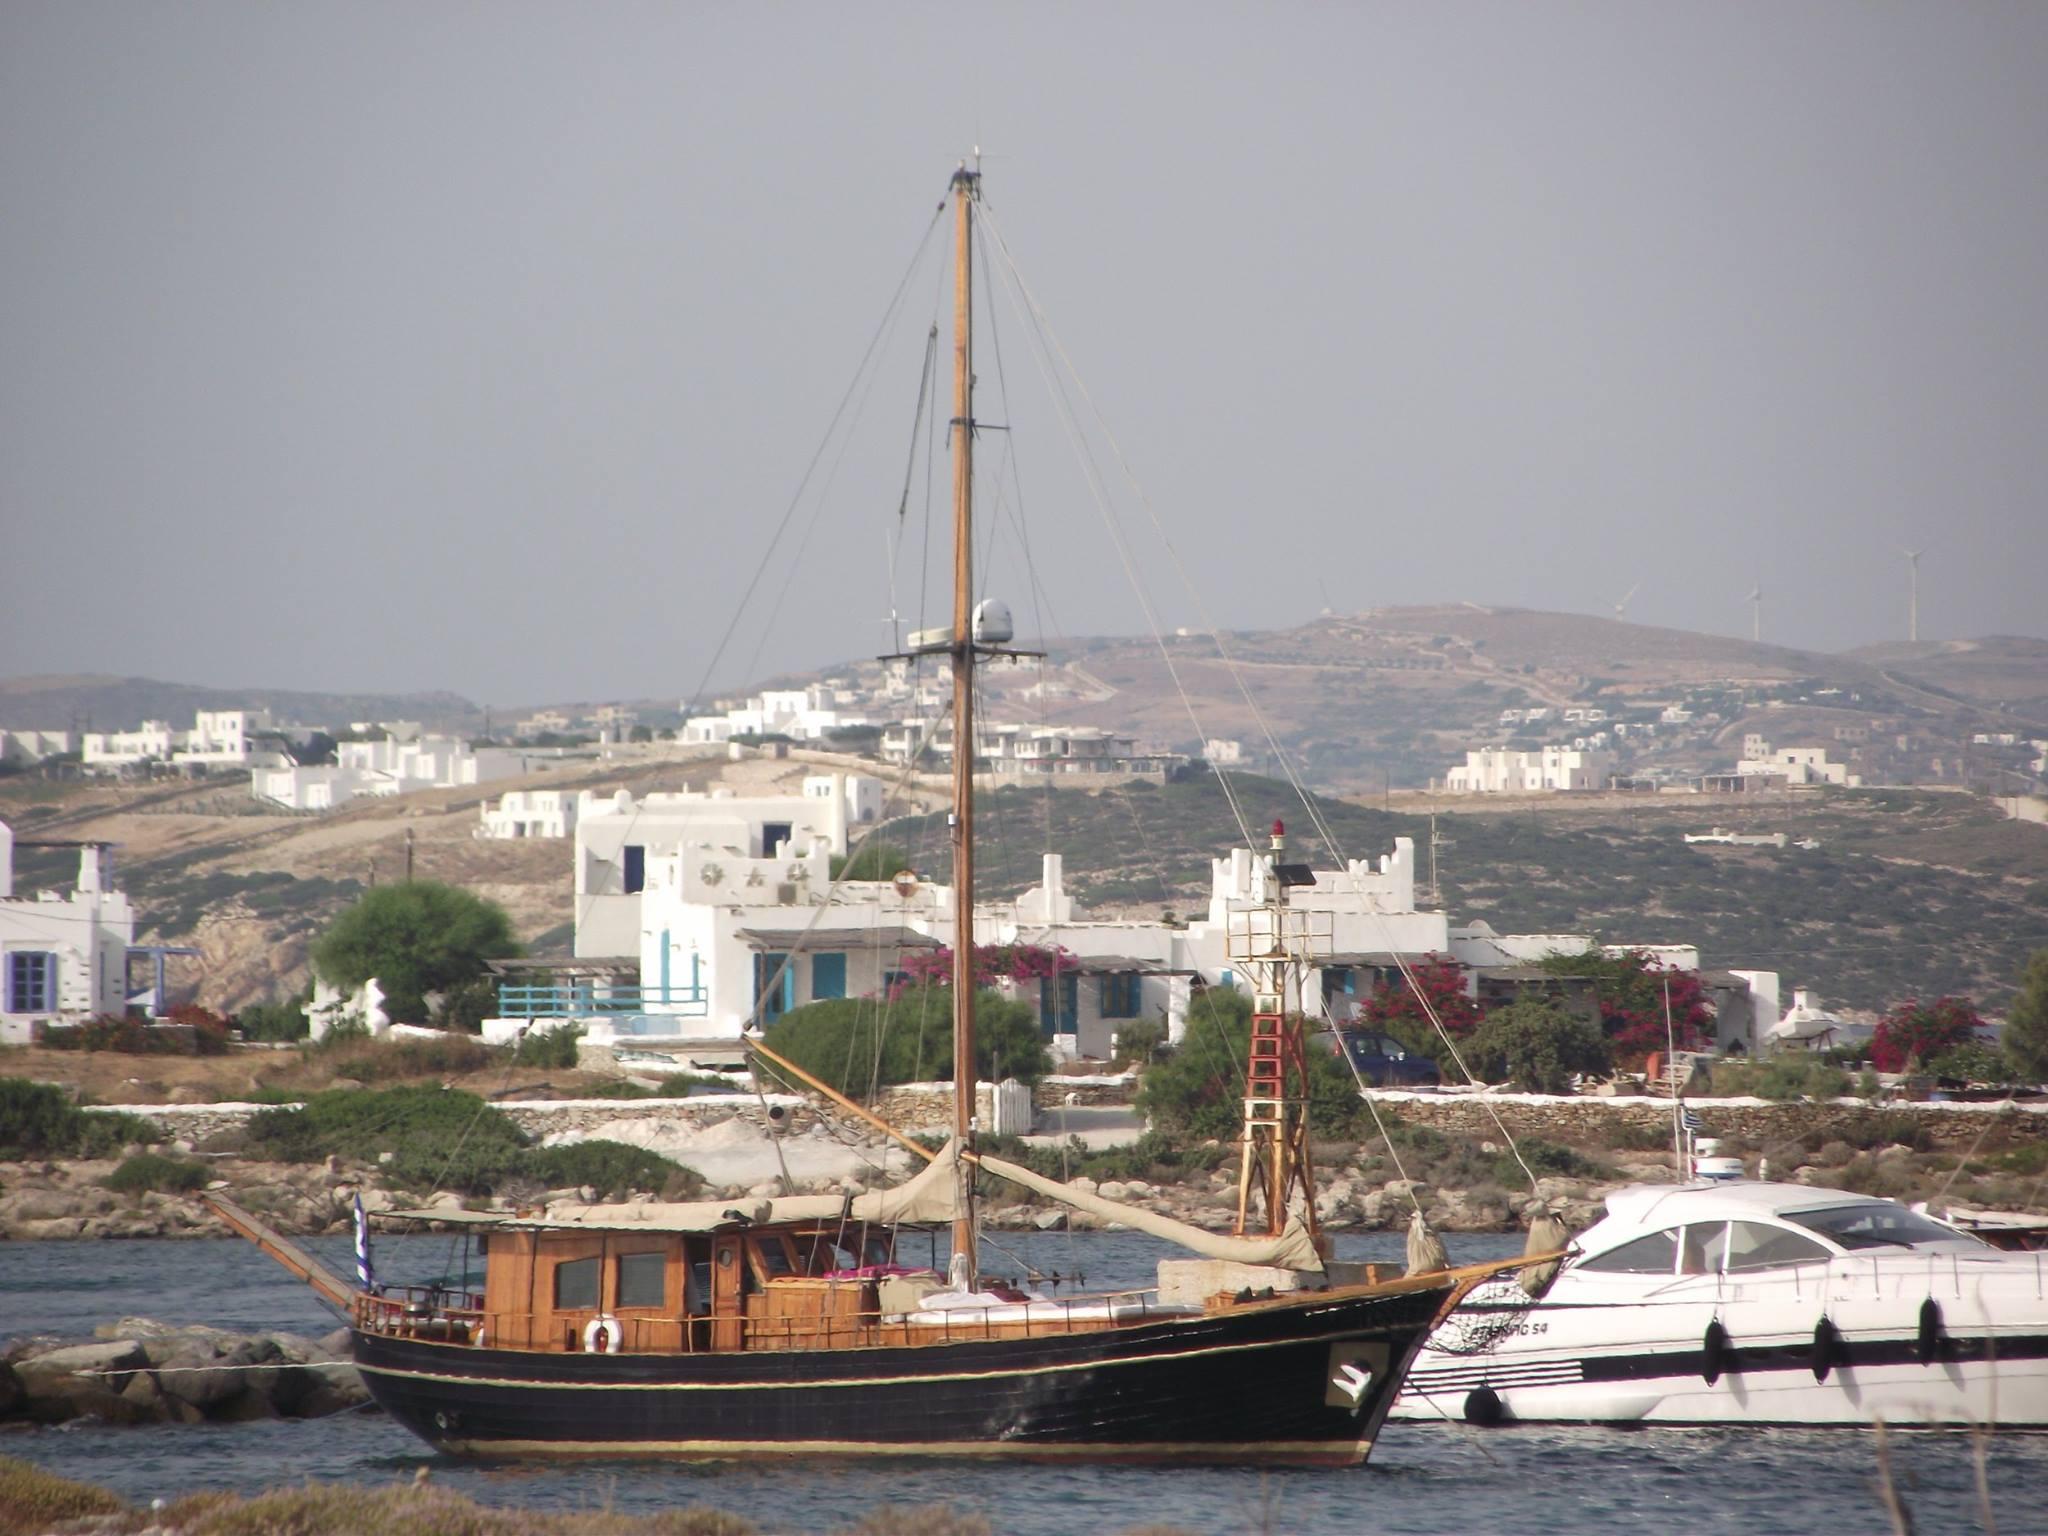 Parikia_harbour_in_the_island_of_Paros_photo_by_Julia_Marmotti